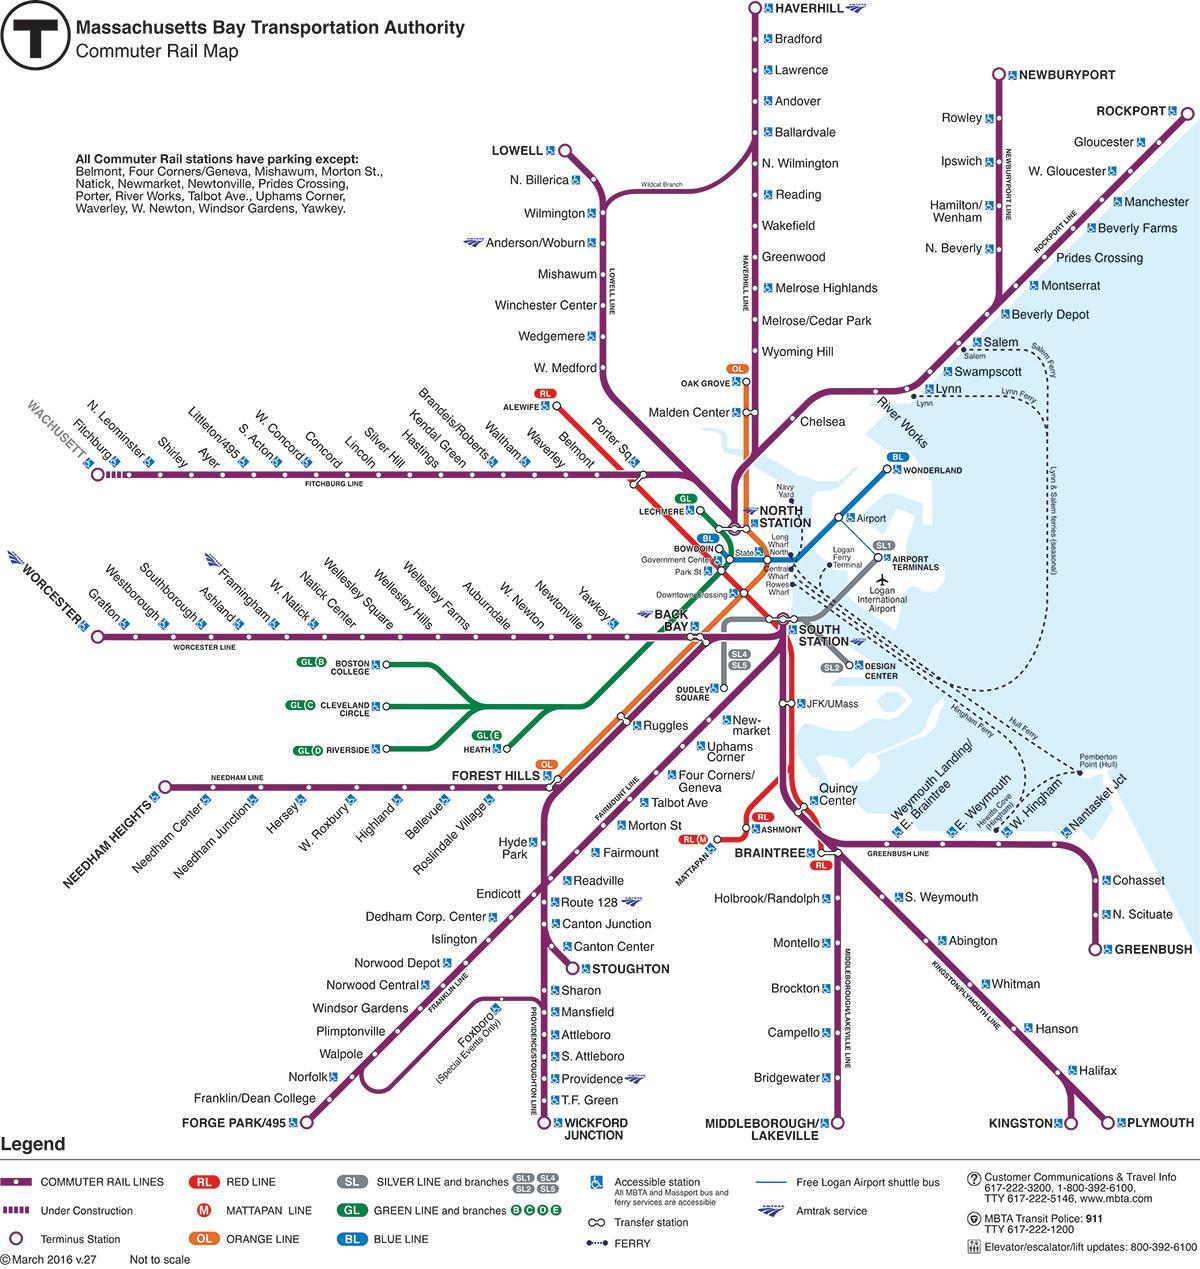 Boston train map - Boston train station map (United States of America)